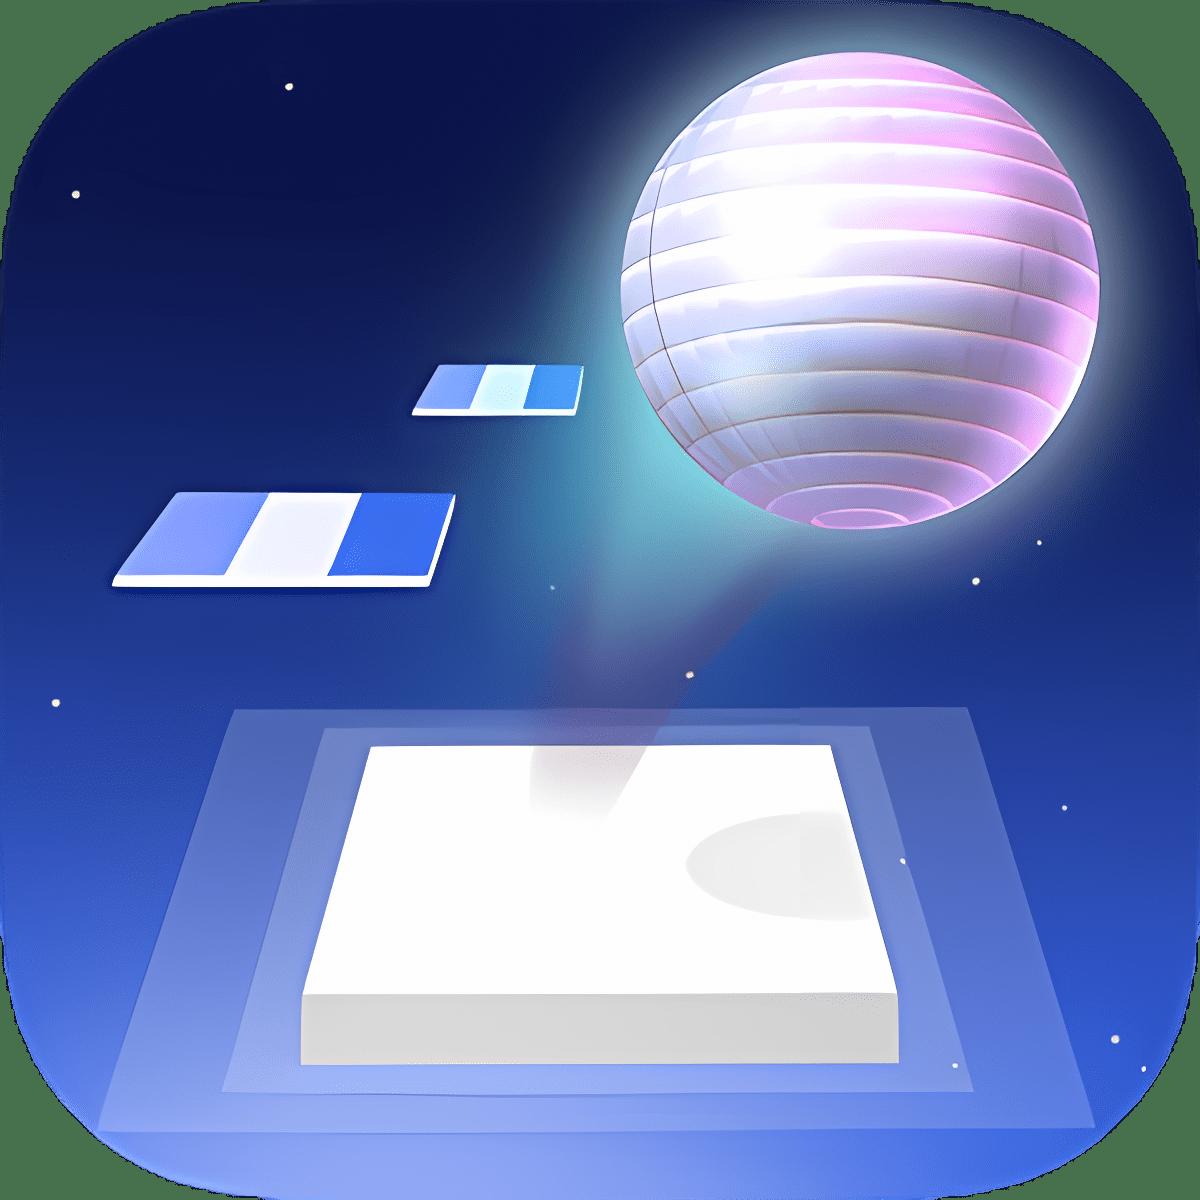 Dancing Ball 2 music game